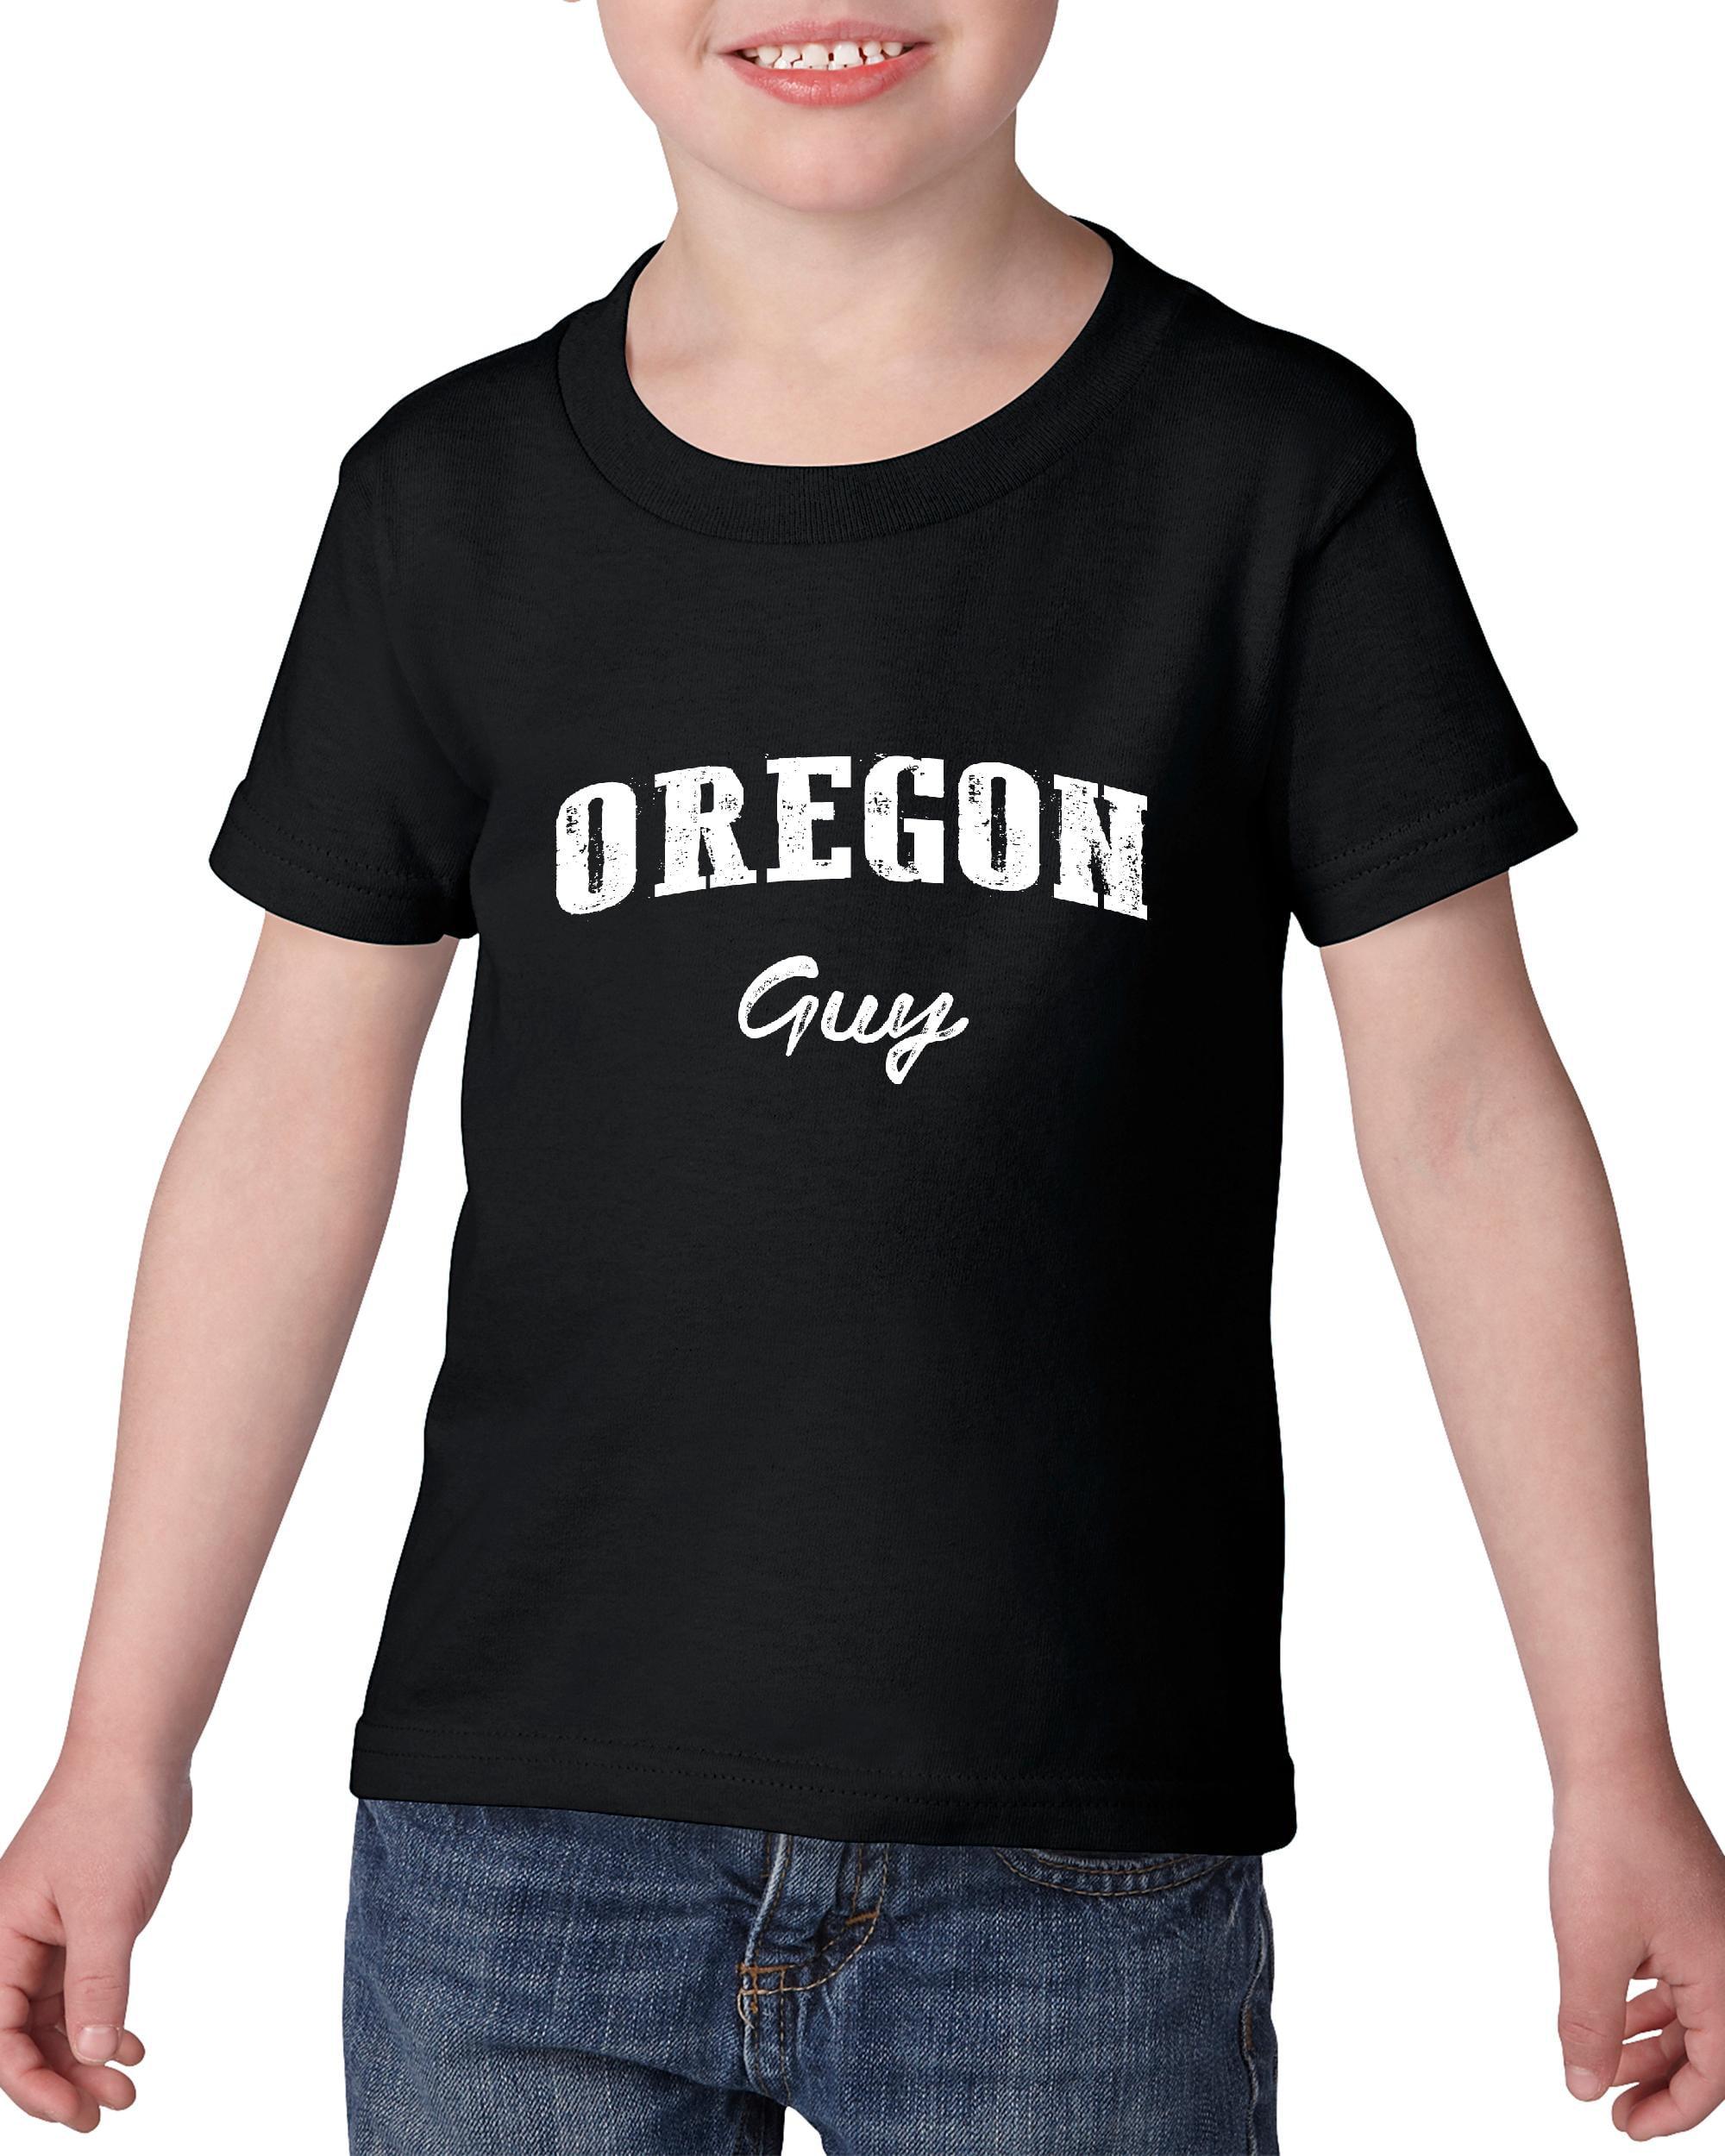 Artix OR Guy Oregon Flag Portland Map Beavers Home of Oregon State University Heavy Cotton Toddler Kids T-Shirt Tee Clothing